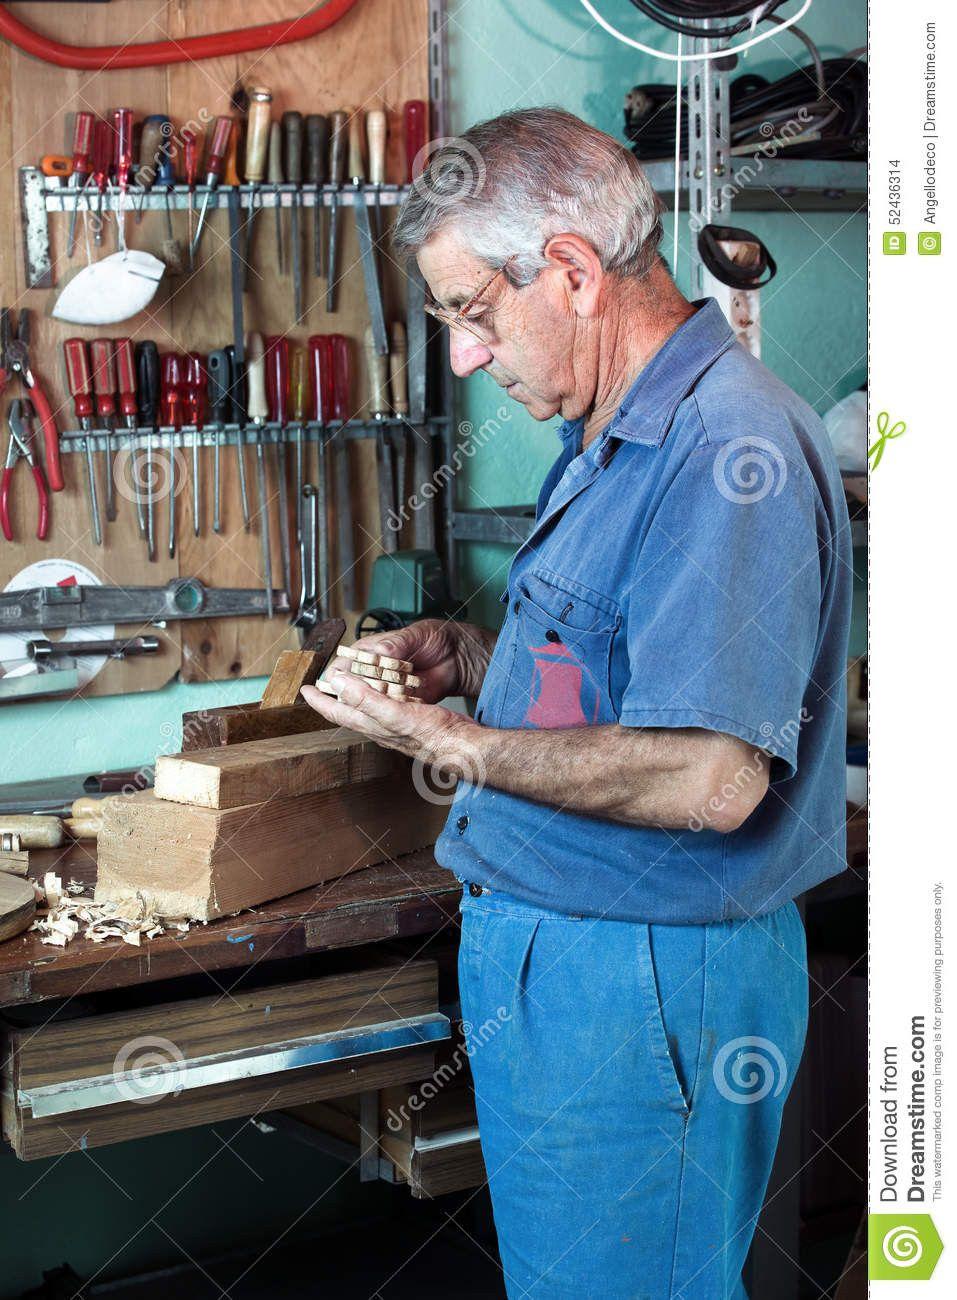 Astonishing Pin By Rahayu12 On Interior Analogi Woodworking Projects Download Free Architecture Designs Pendunizatbritishbridgeorg